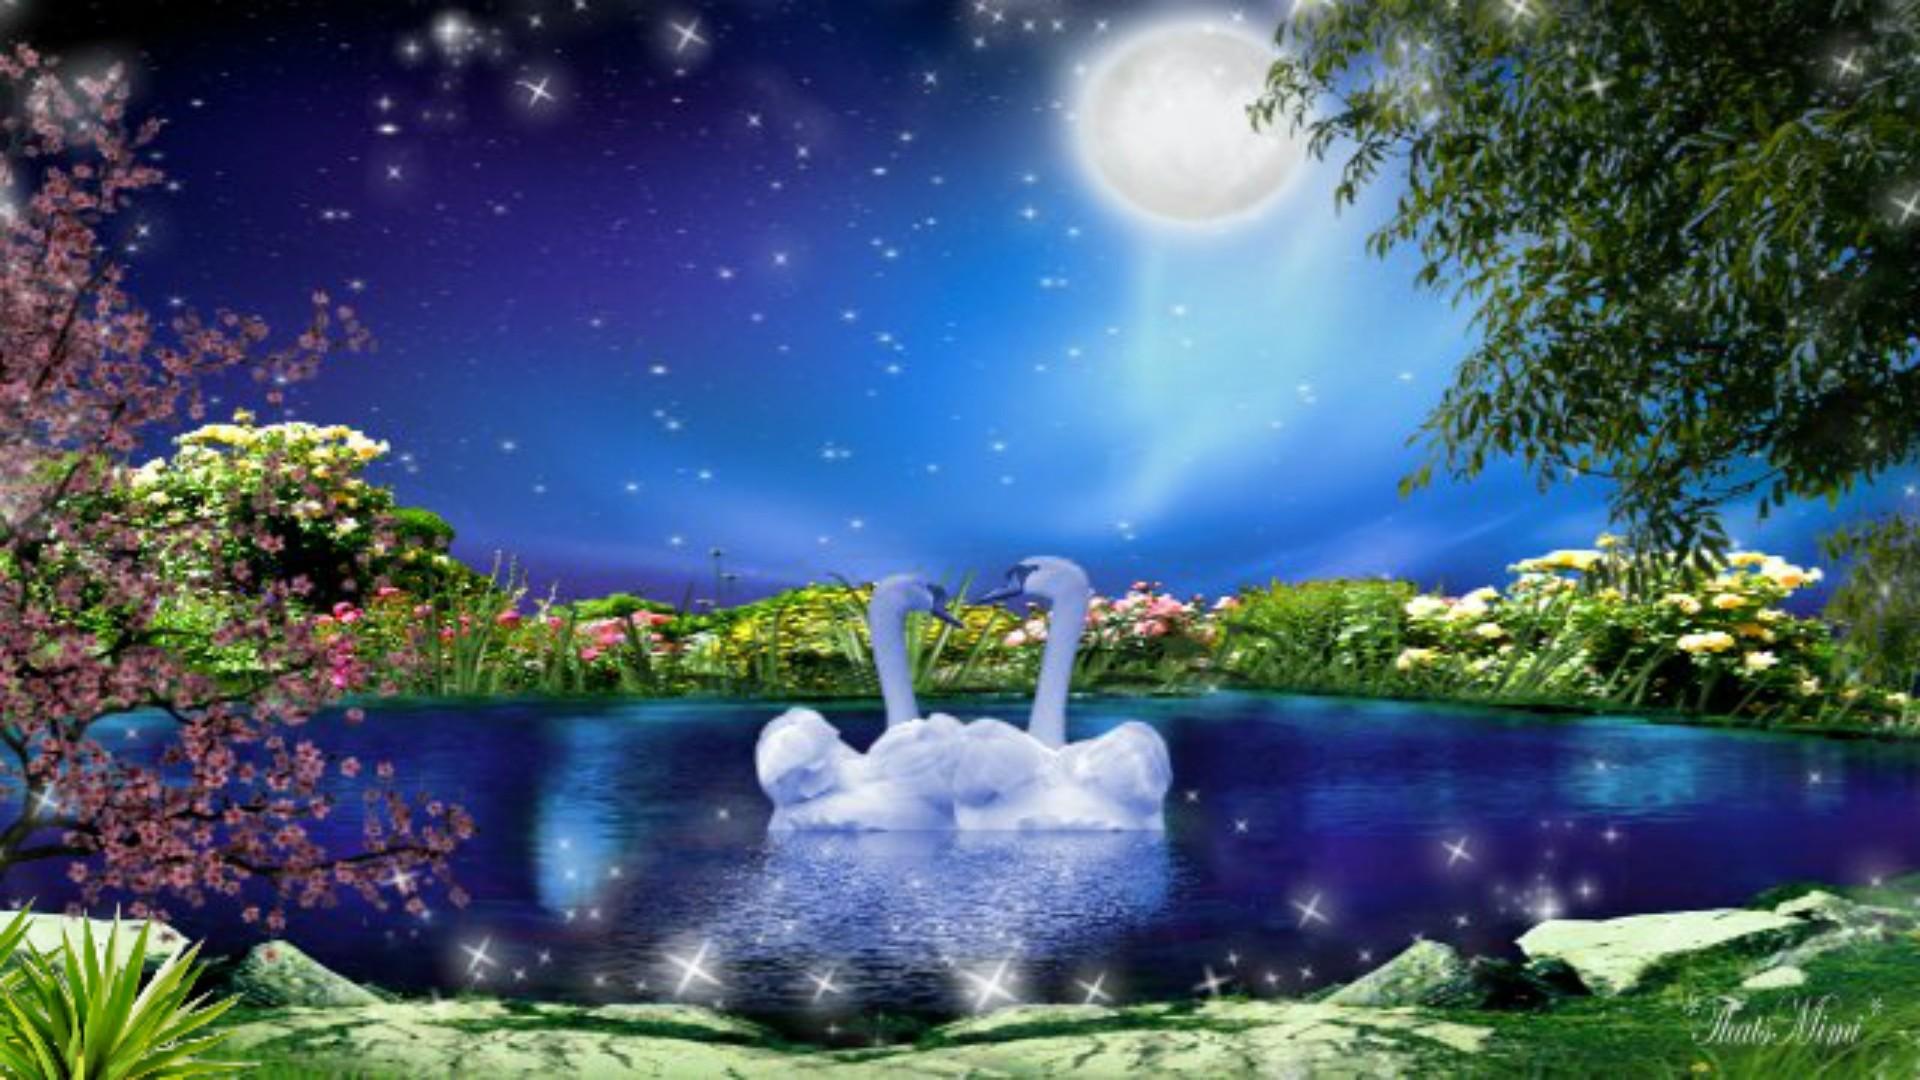 1920x1080, Romantic Full Moon Wallpaper Full Hd For - Beautiful Romantic Full Moon - HD Wallpaper